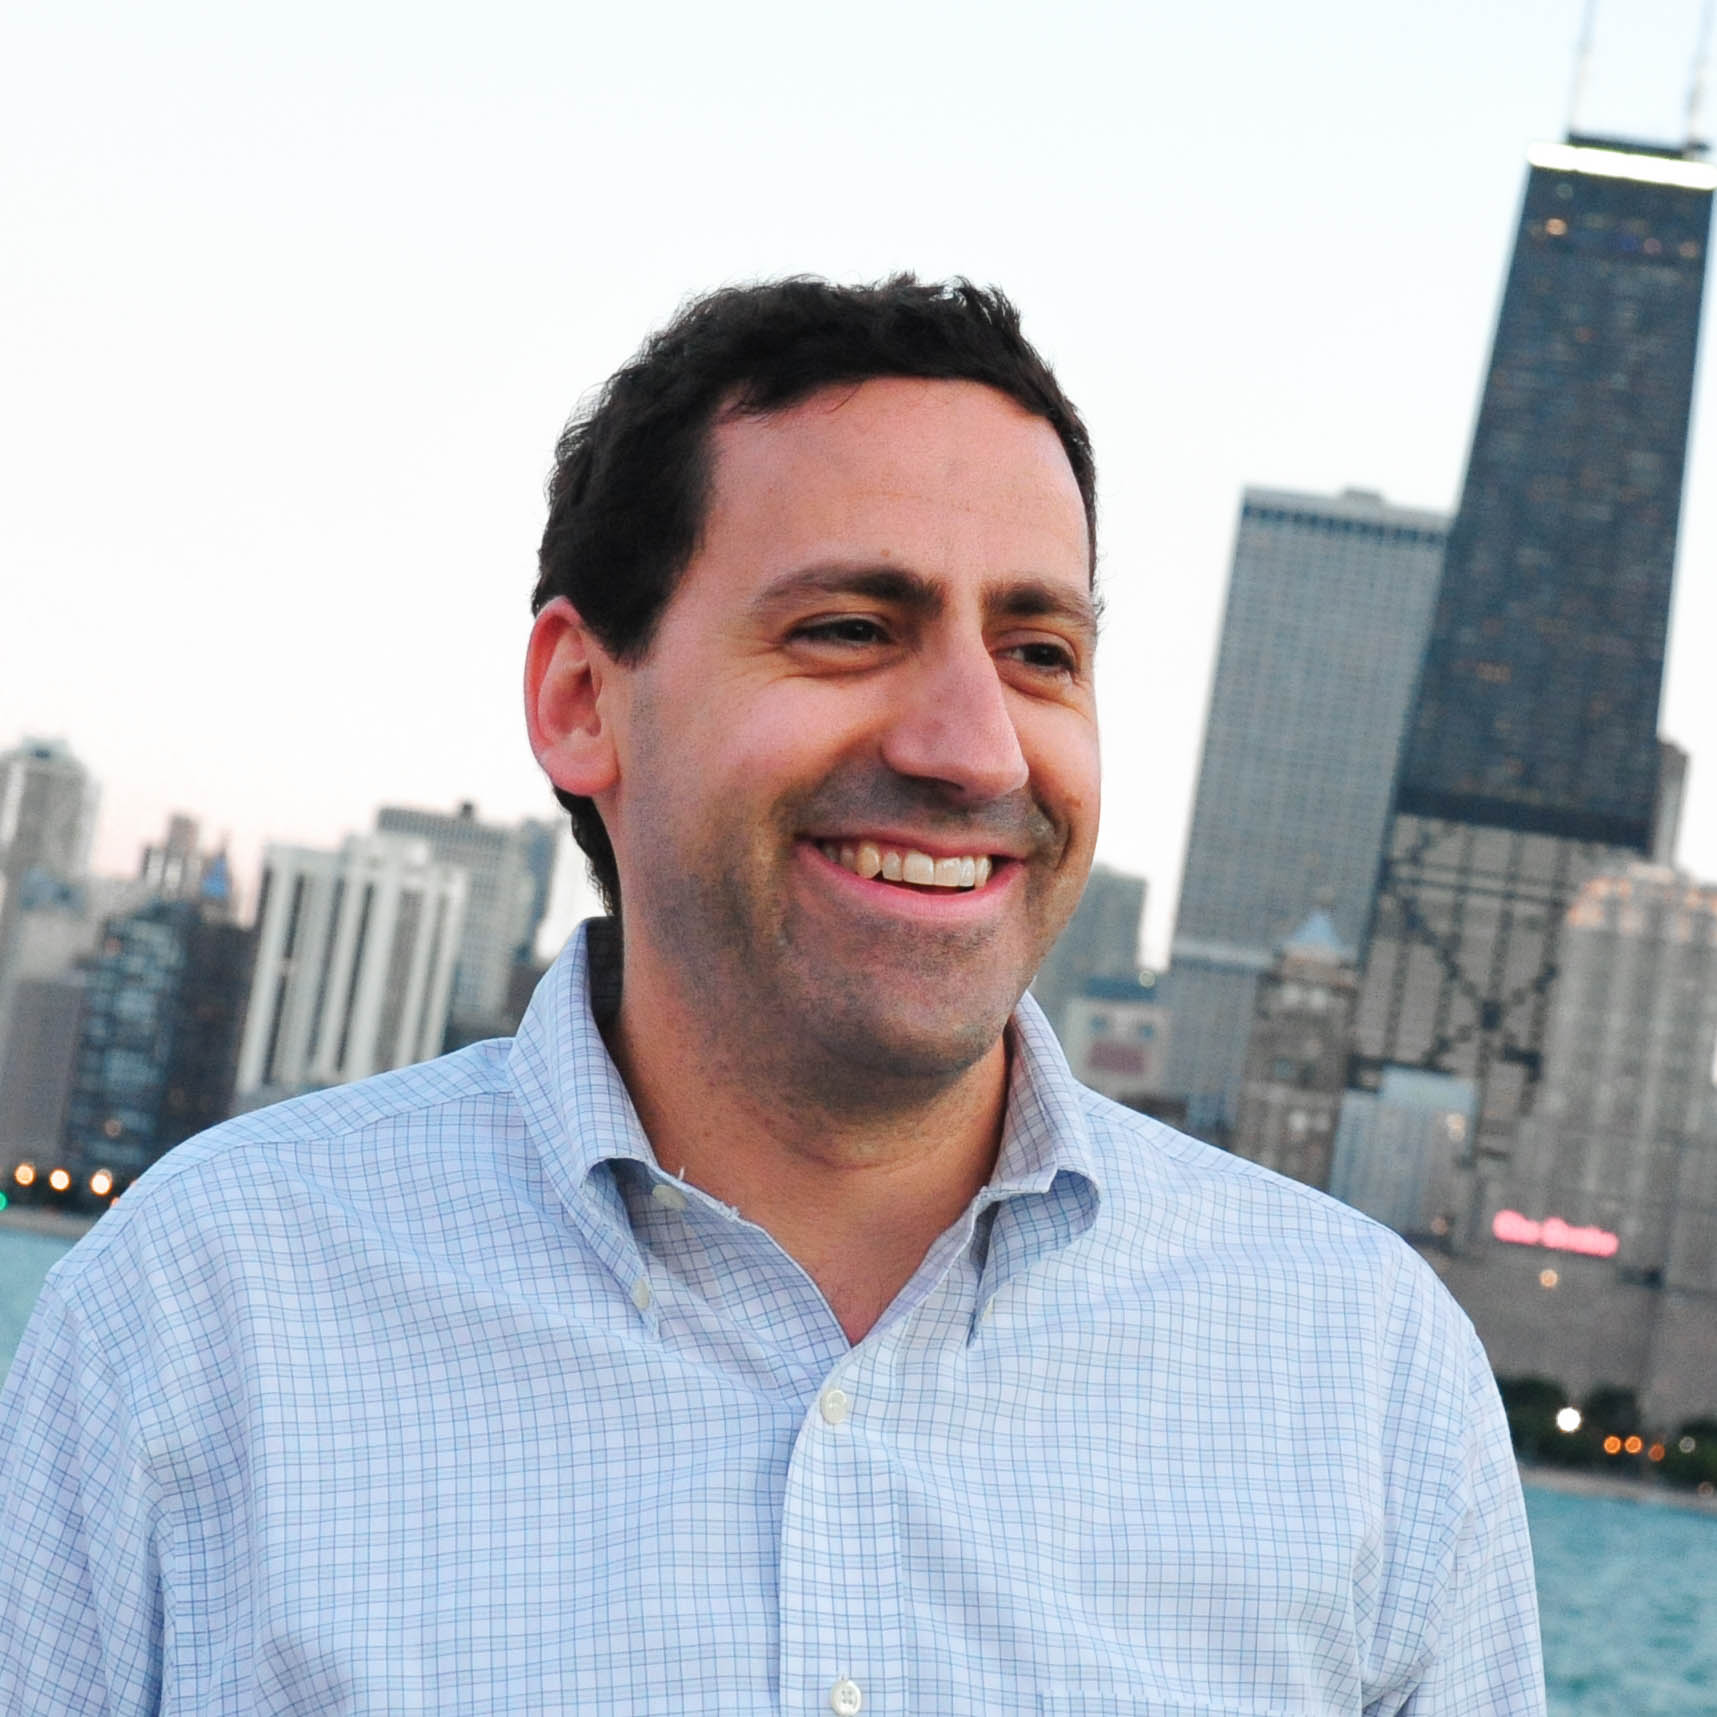 Michael Krasman